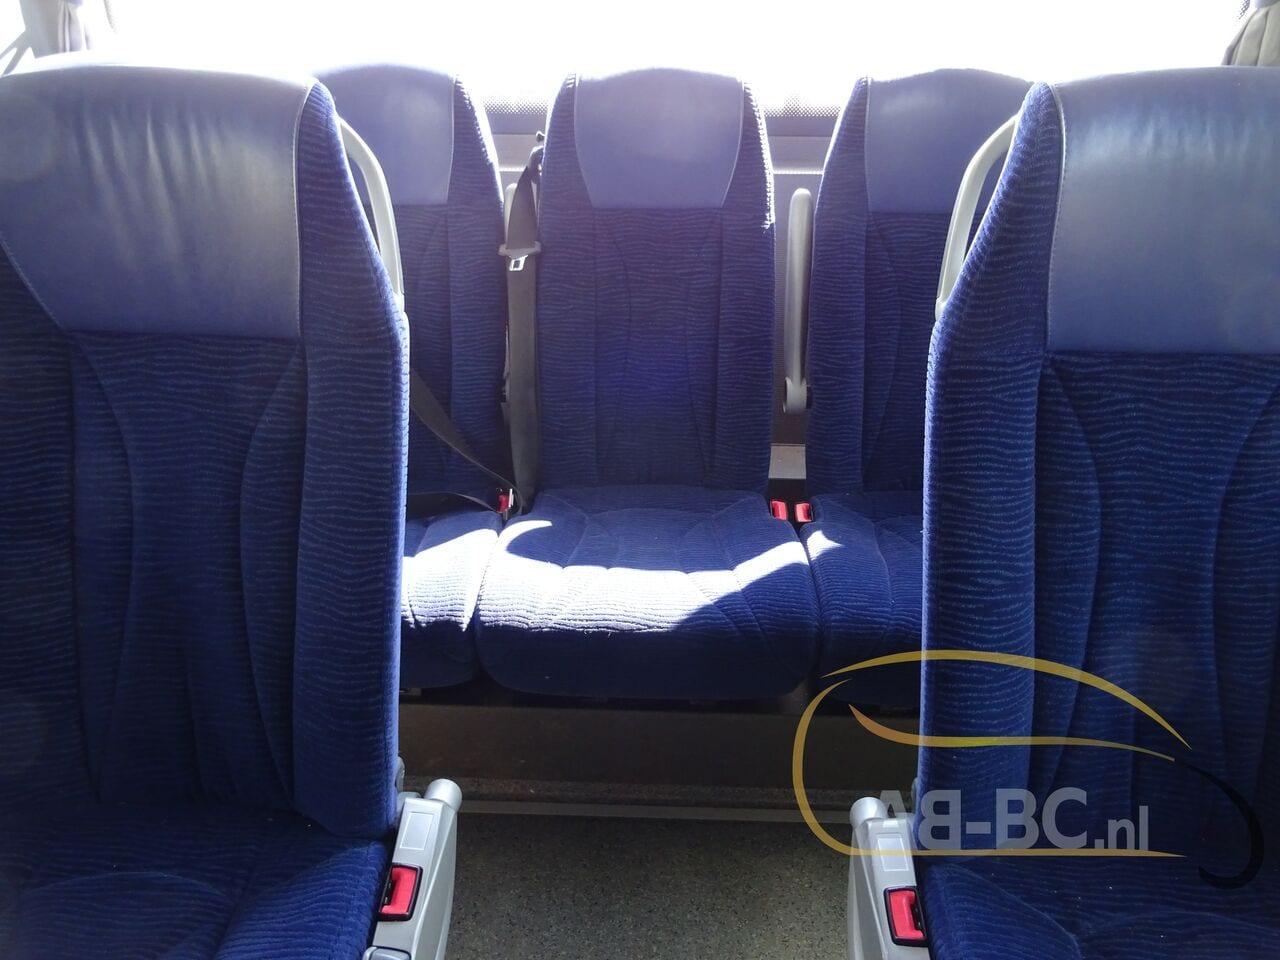 coach-busSETRA-S415-GT-HD-FINAL-EDITION-51-SEATS-LIFTBUS---1620382085225890666_big_df270030f08ce72700a4f1cda3c10f1c--21050713010665719300